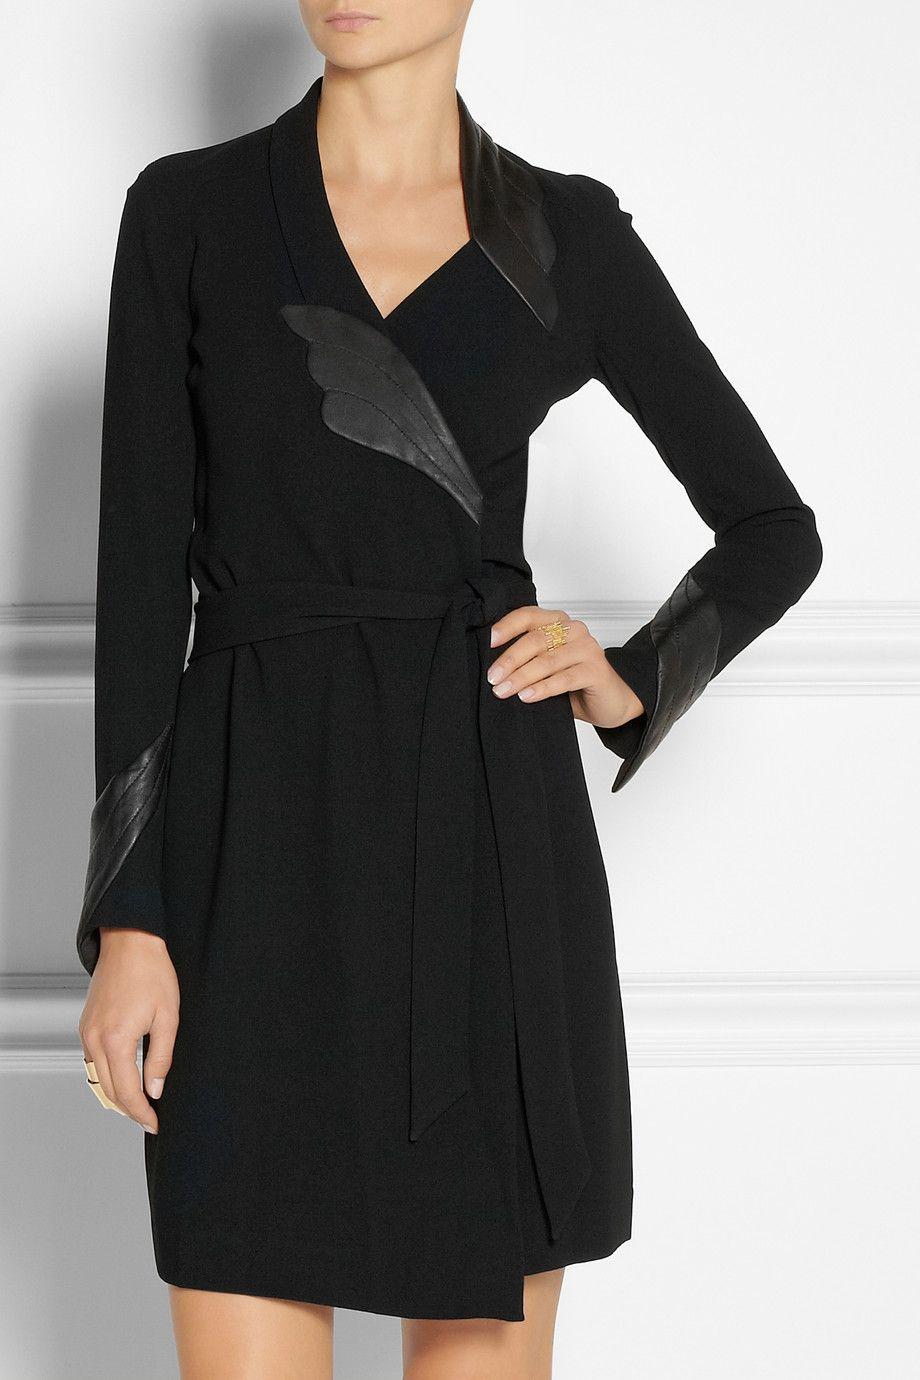 Diane von Furstenberg|Glam leather-detailed crepe wrap dress|NET-A-PORTER